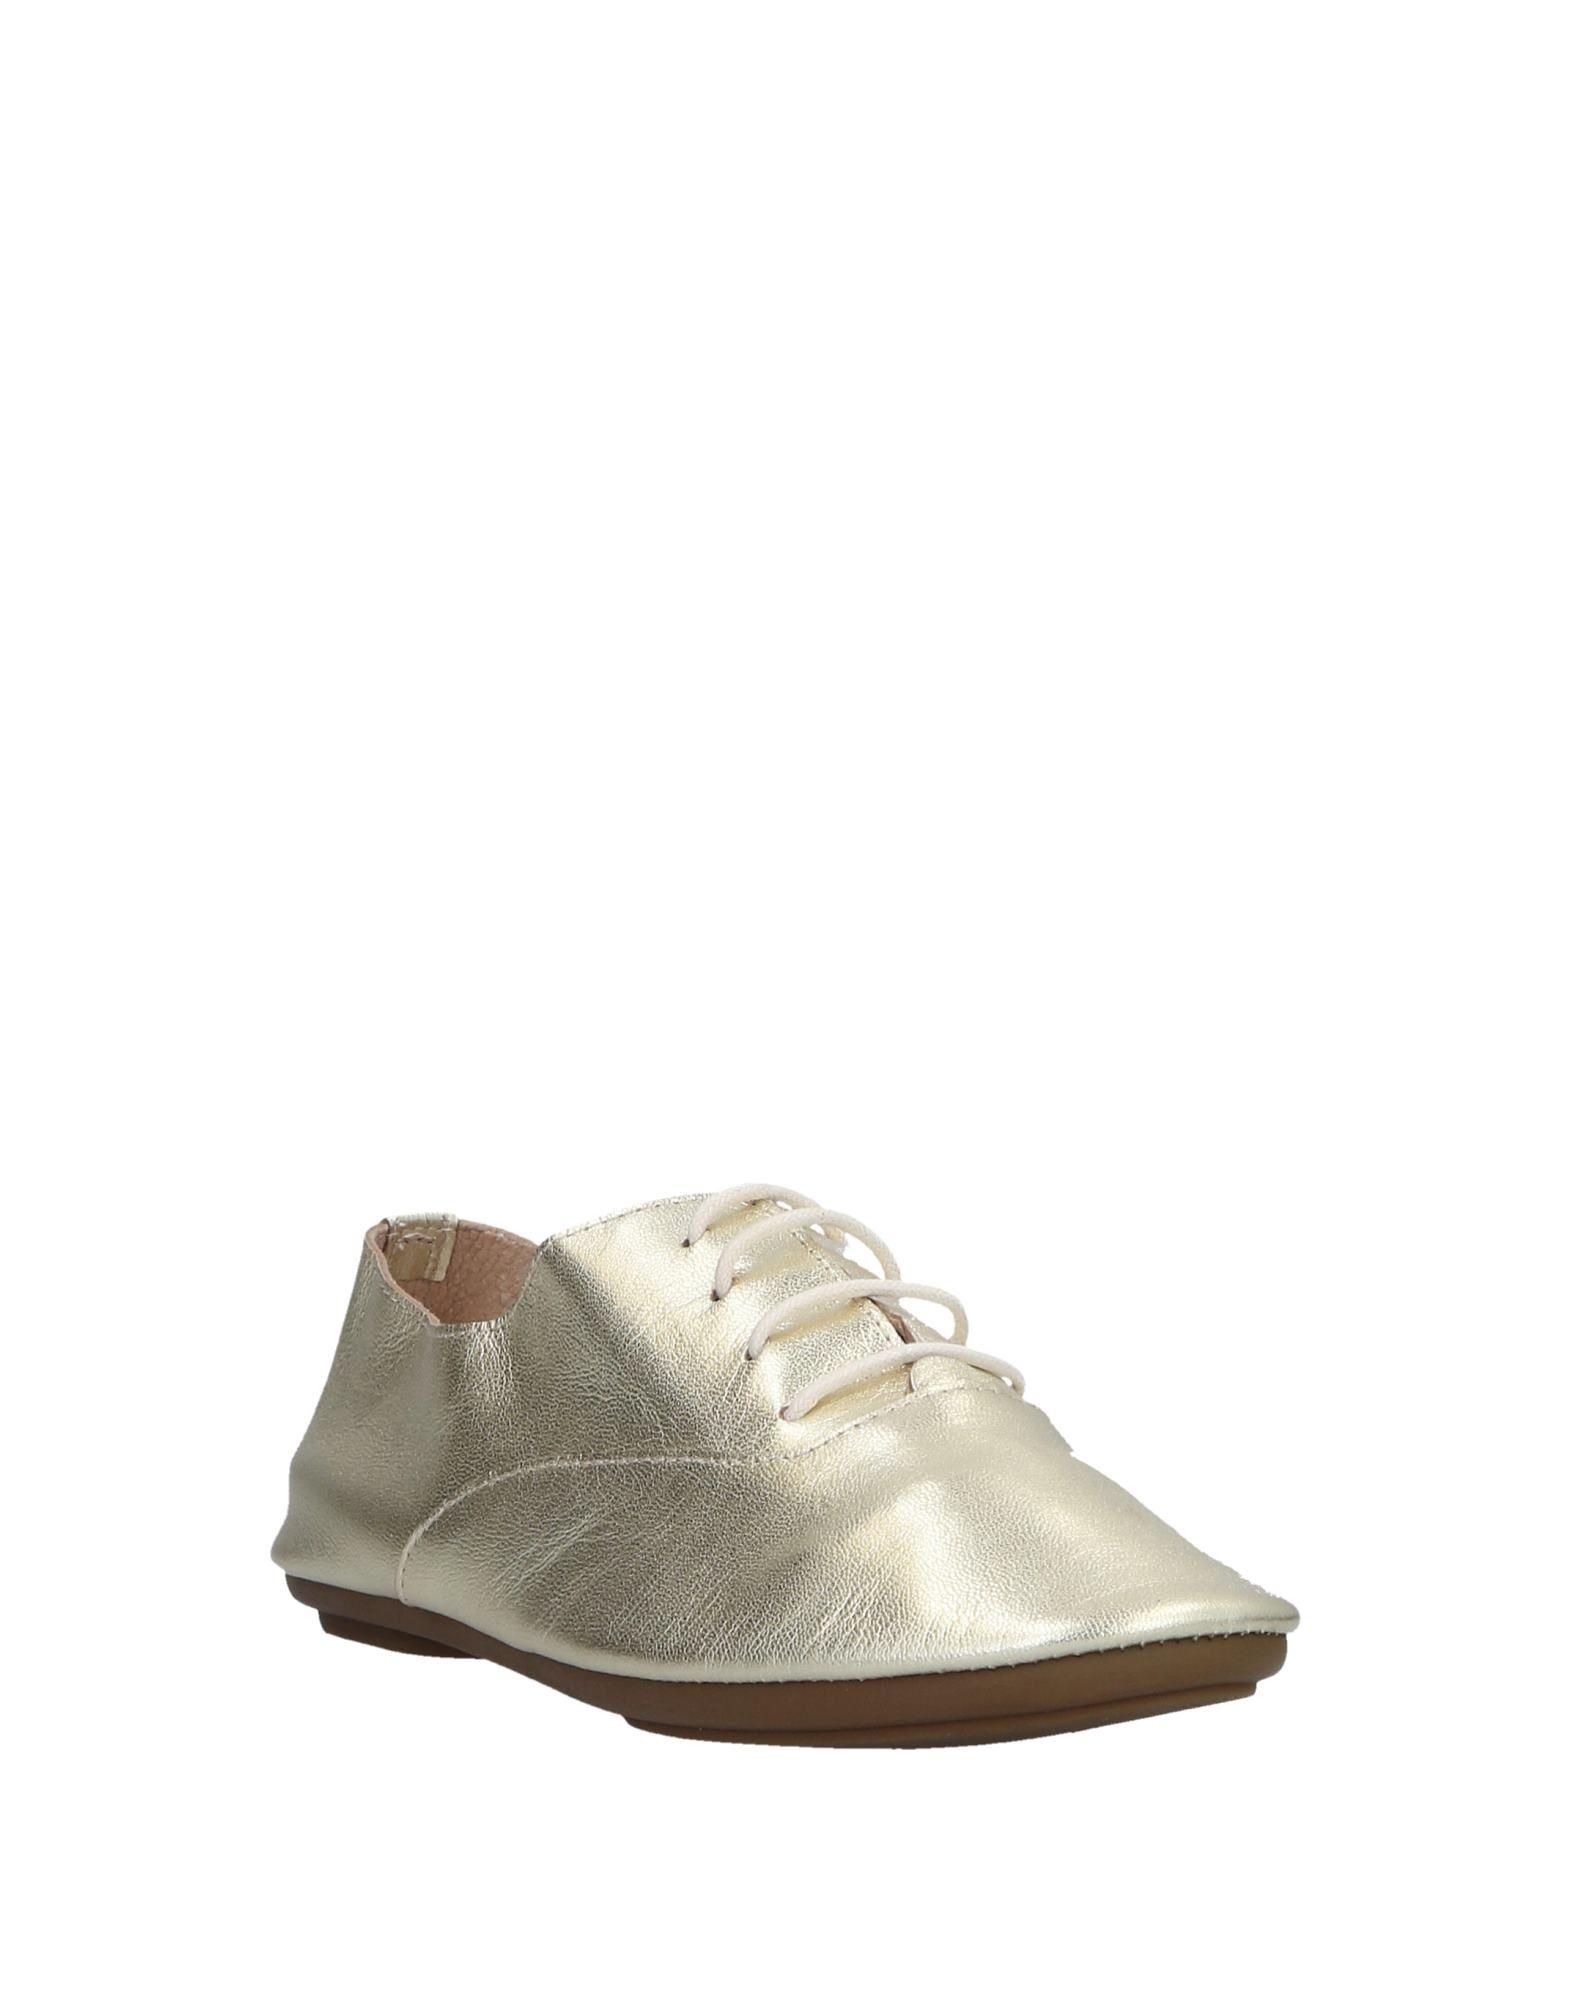 Anothersole Schnürschuhe Damen    11544563PB Heiße Schuhe 9abcc1